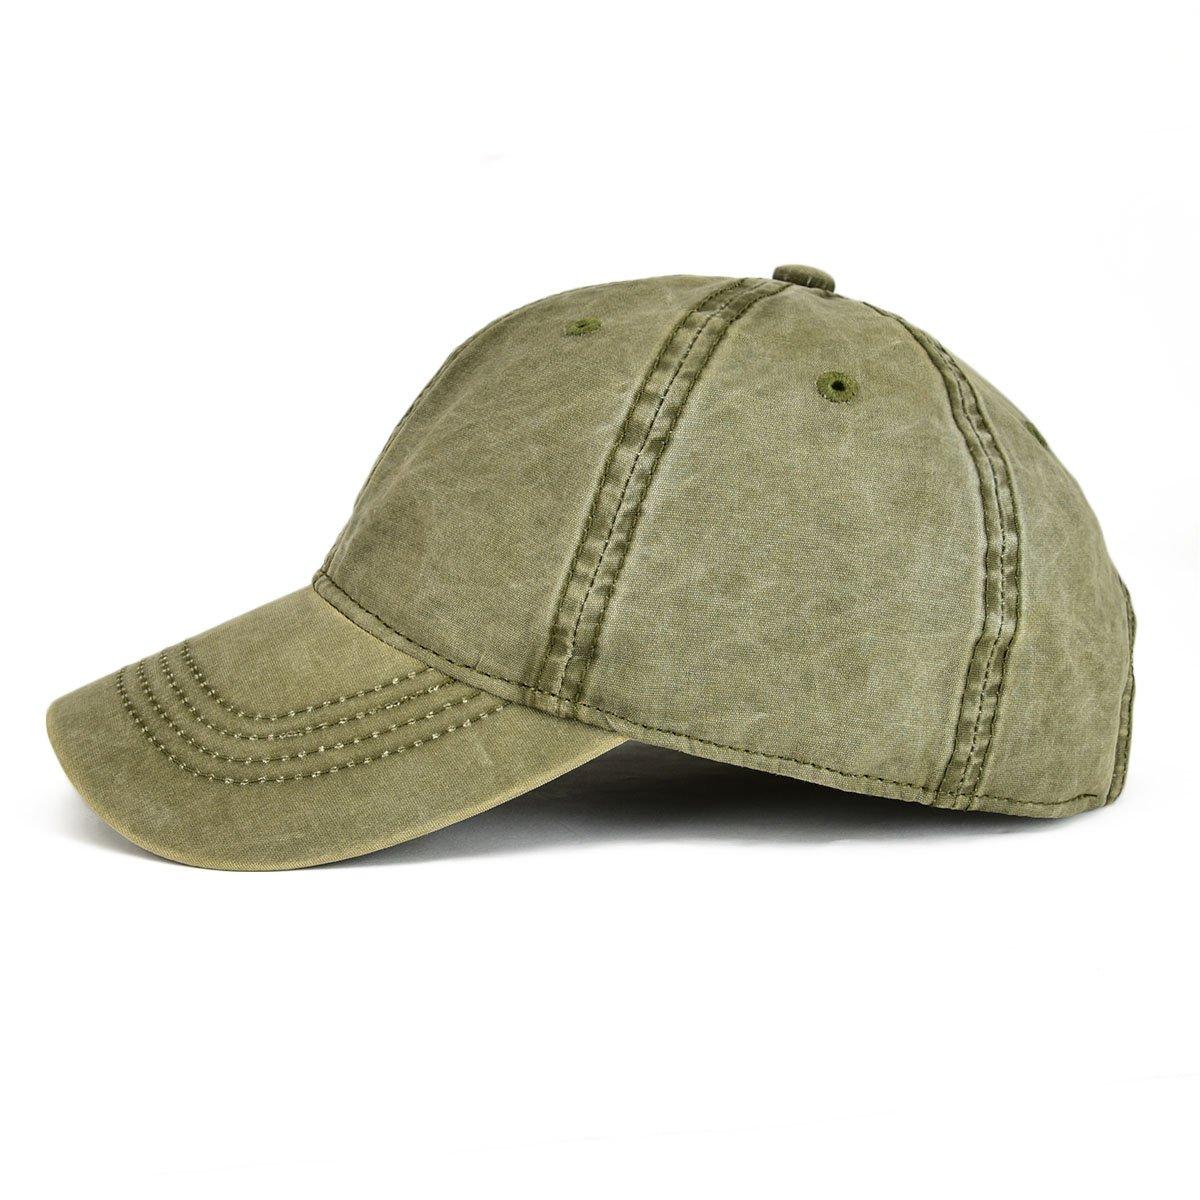 ee44b94ec32 VOBOOM Men Washed Cotton Vintage Dad Hat Adjustable Baseball Cap Trucker Hat  (Army Green) at Amazon Men s Clothing store